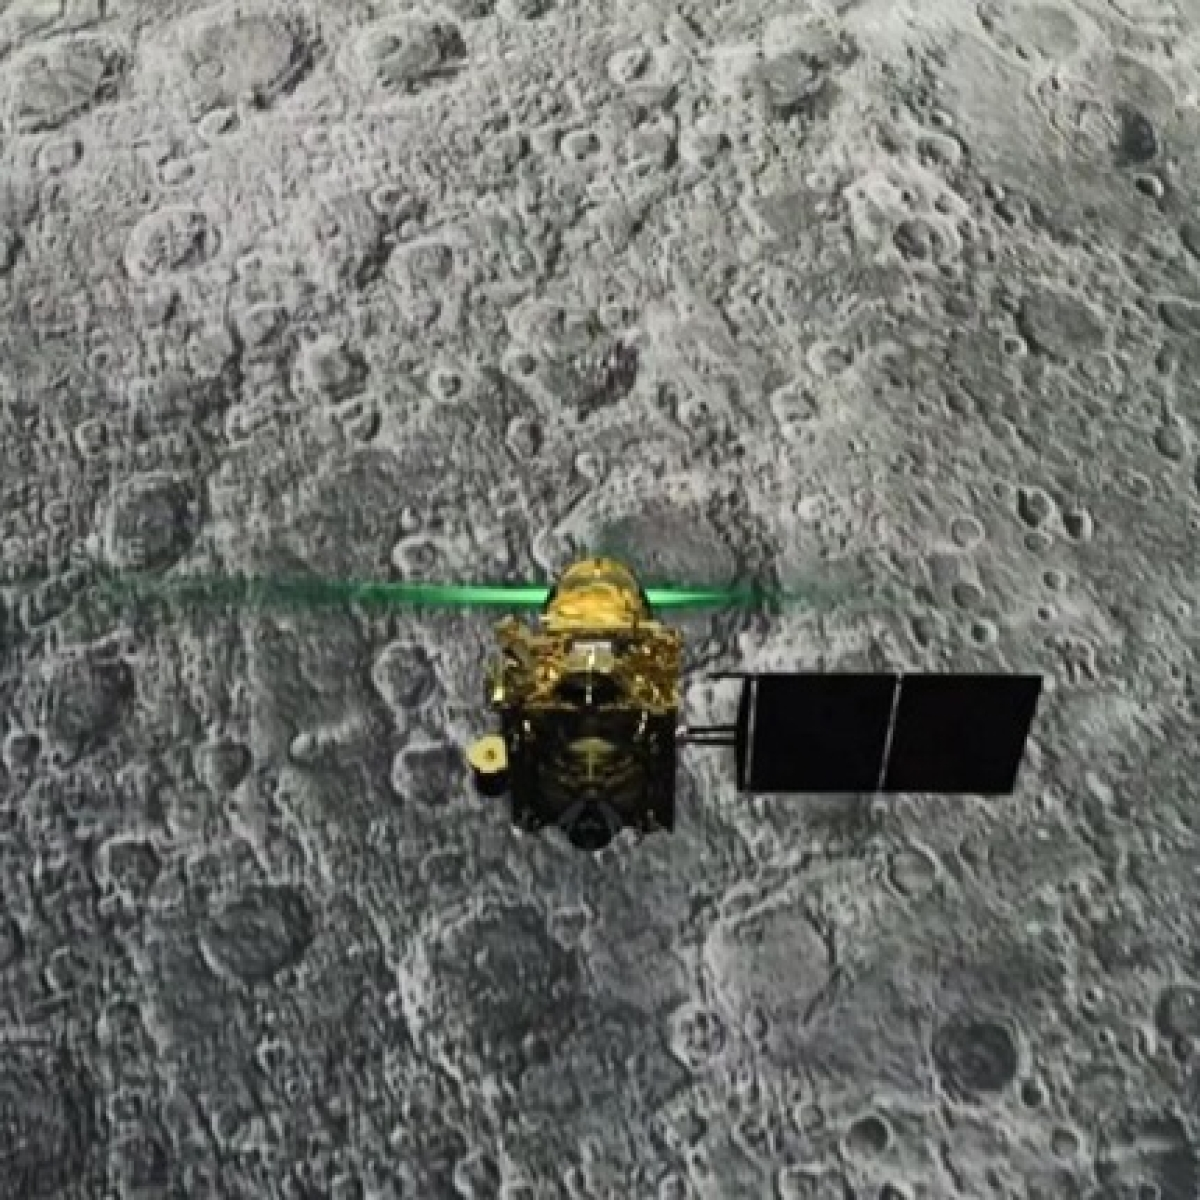 Latest Moon flyby finds no trace of India's Chandrayaan-2 Vikram lander: NASA